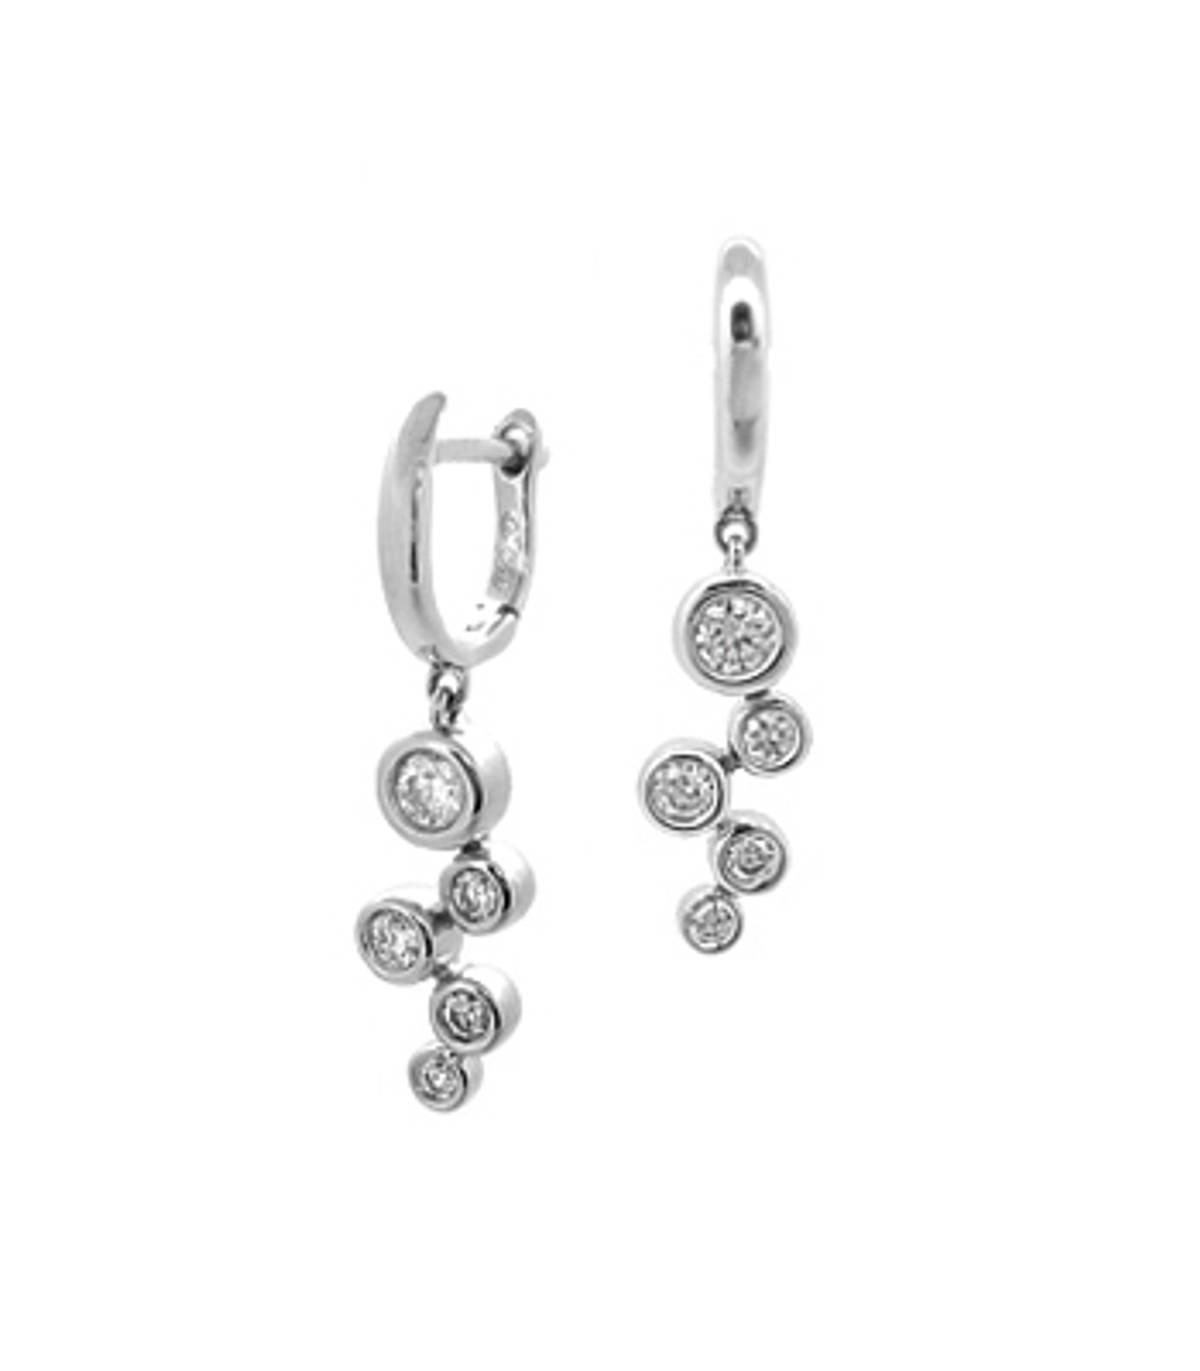 DE2717Diamond rubover set fancy drop earringsPictured item: total 0.38ct brilliant cut diamonds set in 18k white gold